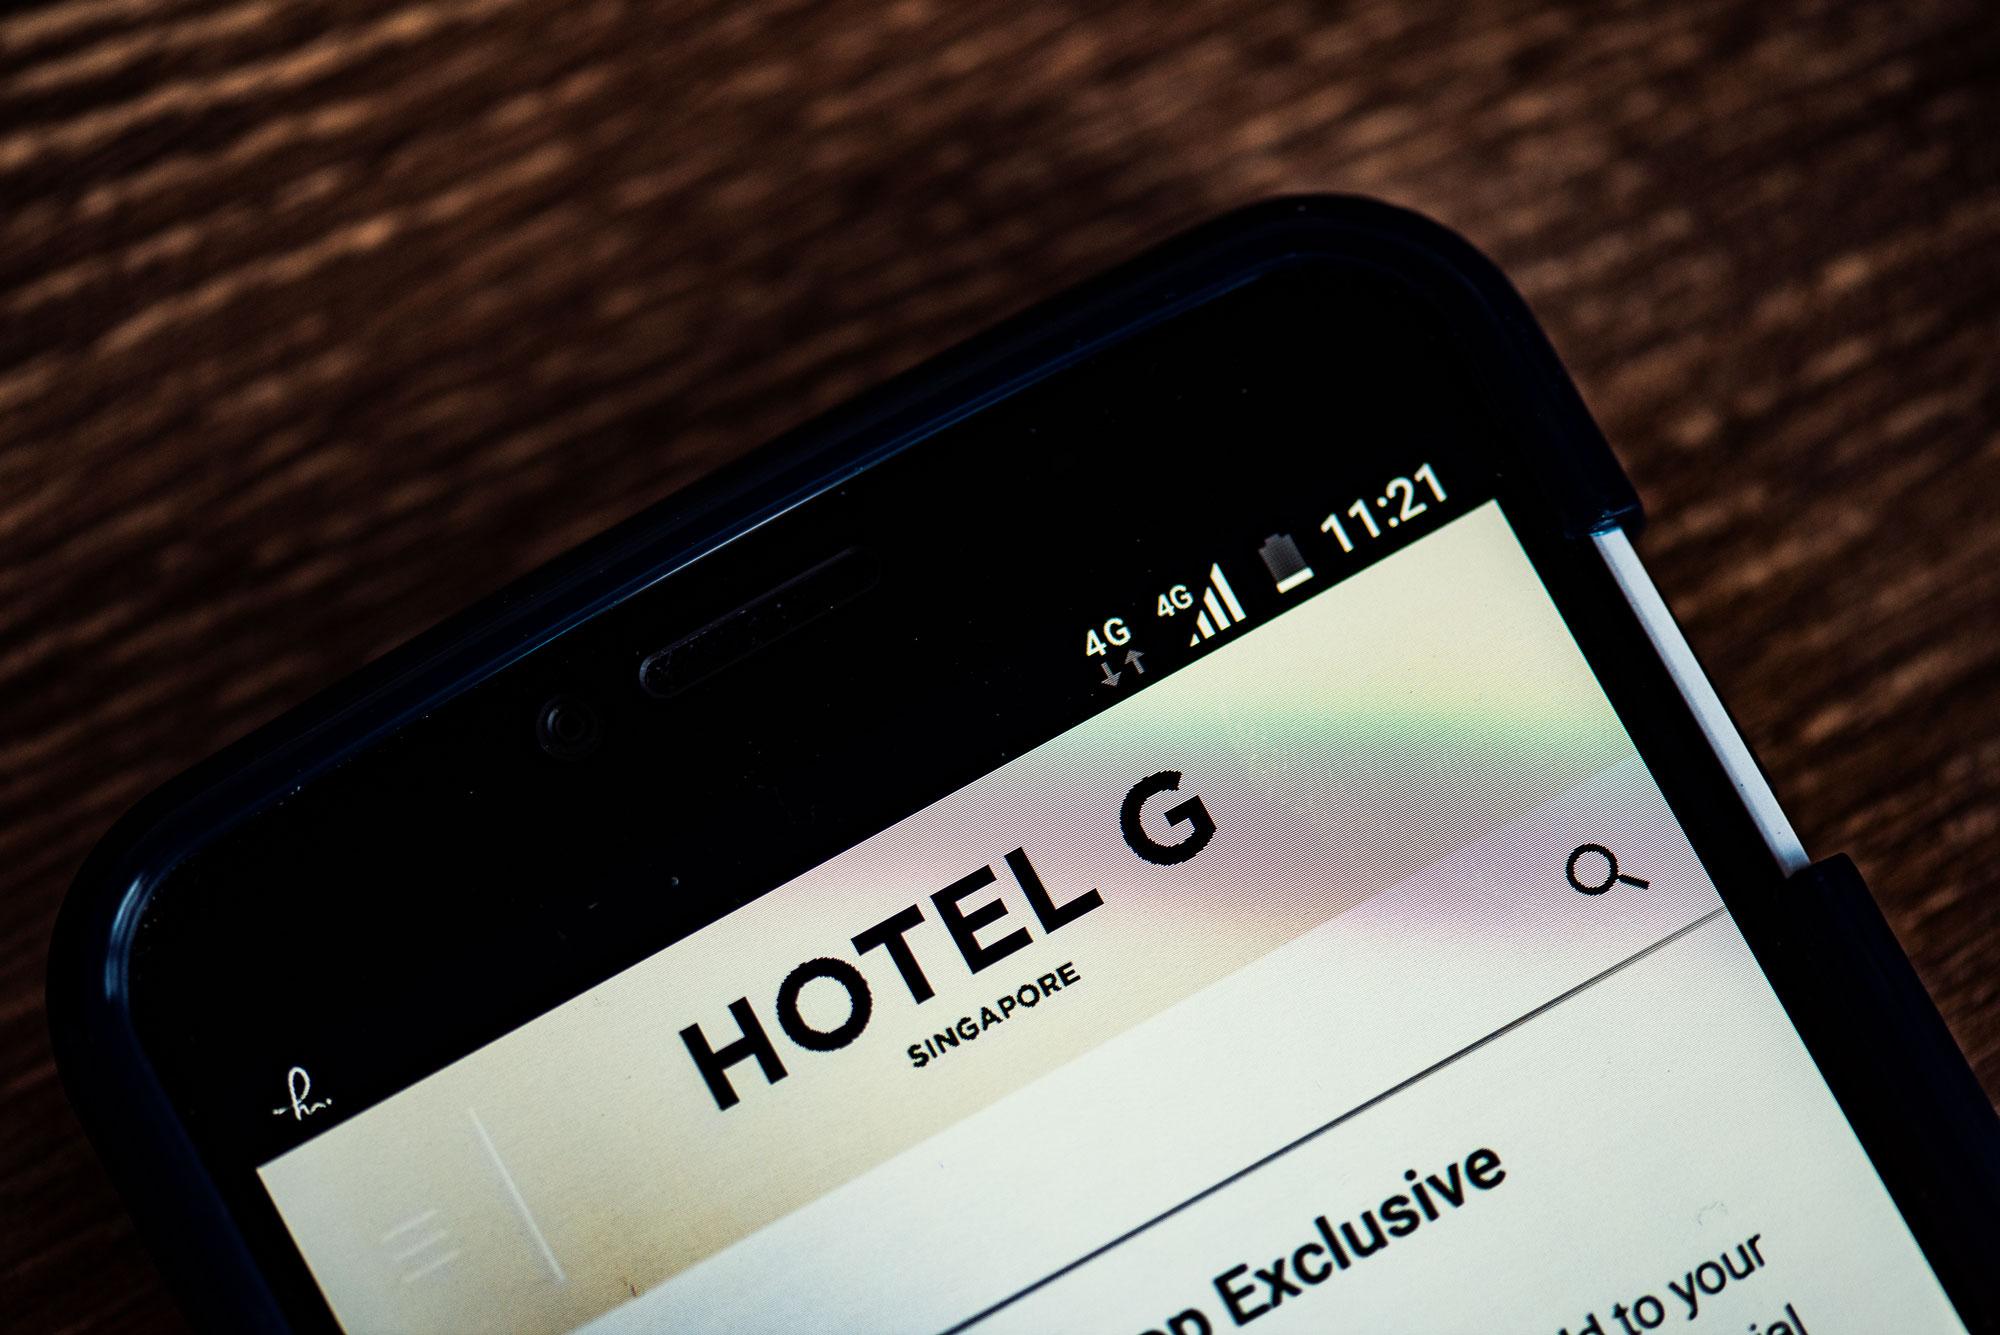 Hotel G Singapore online